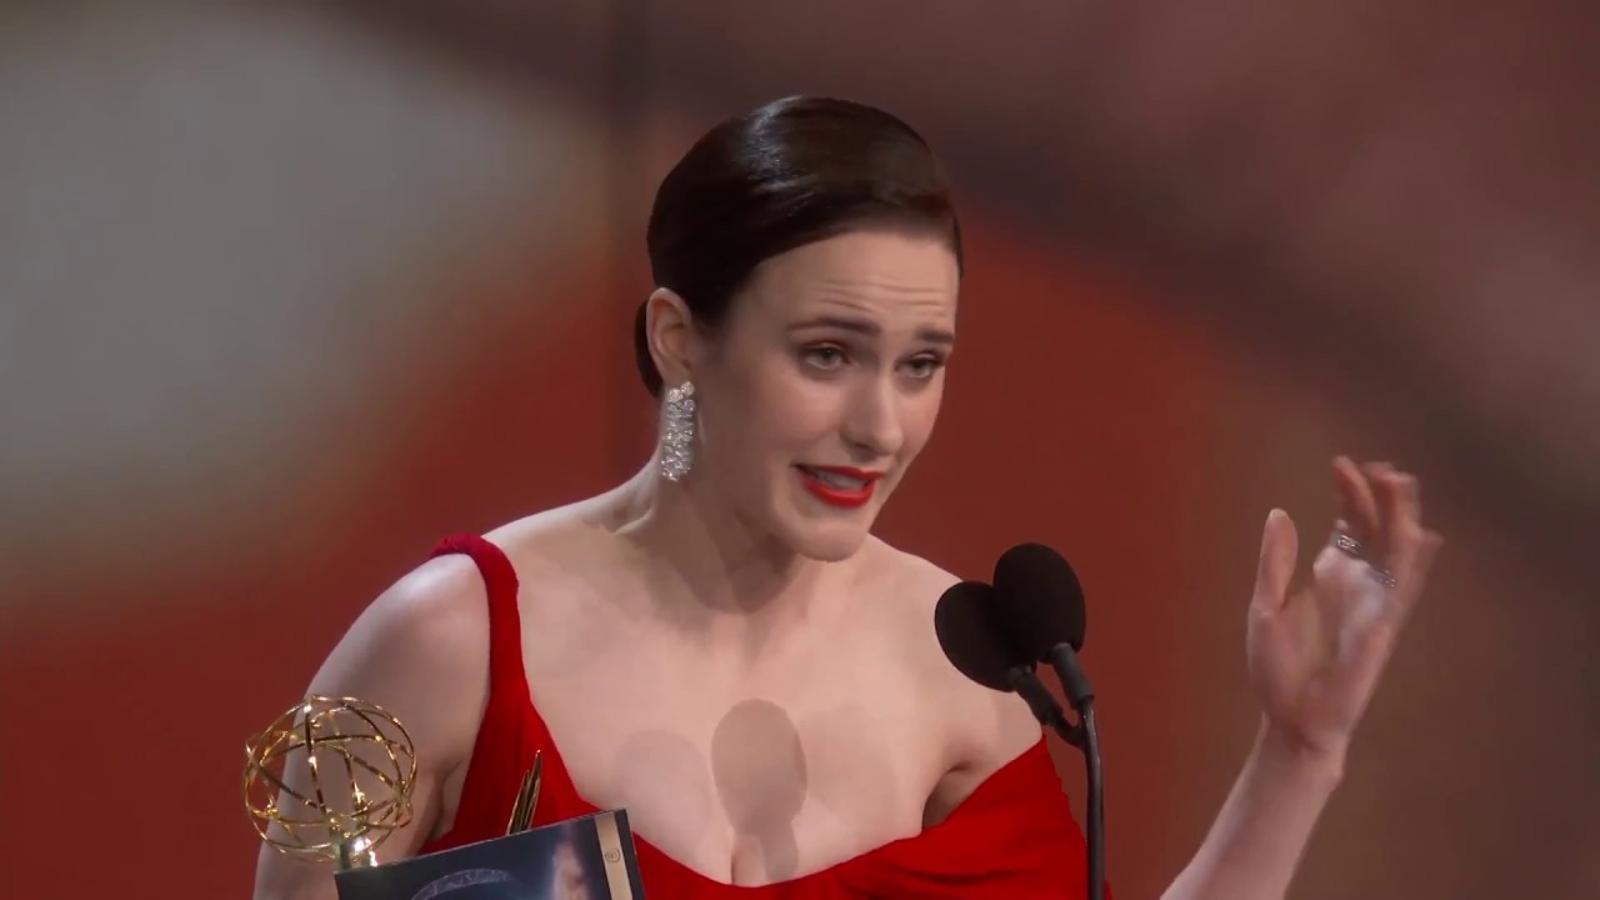 Rachel Brosnahan recollint el premis a millor actriu protagonista per 'The marvelous Mrs. Maisel'